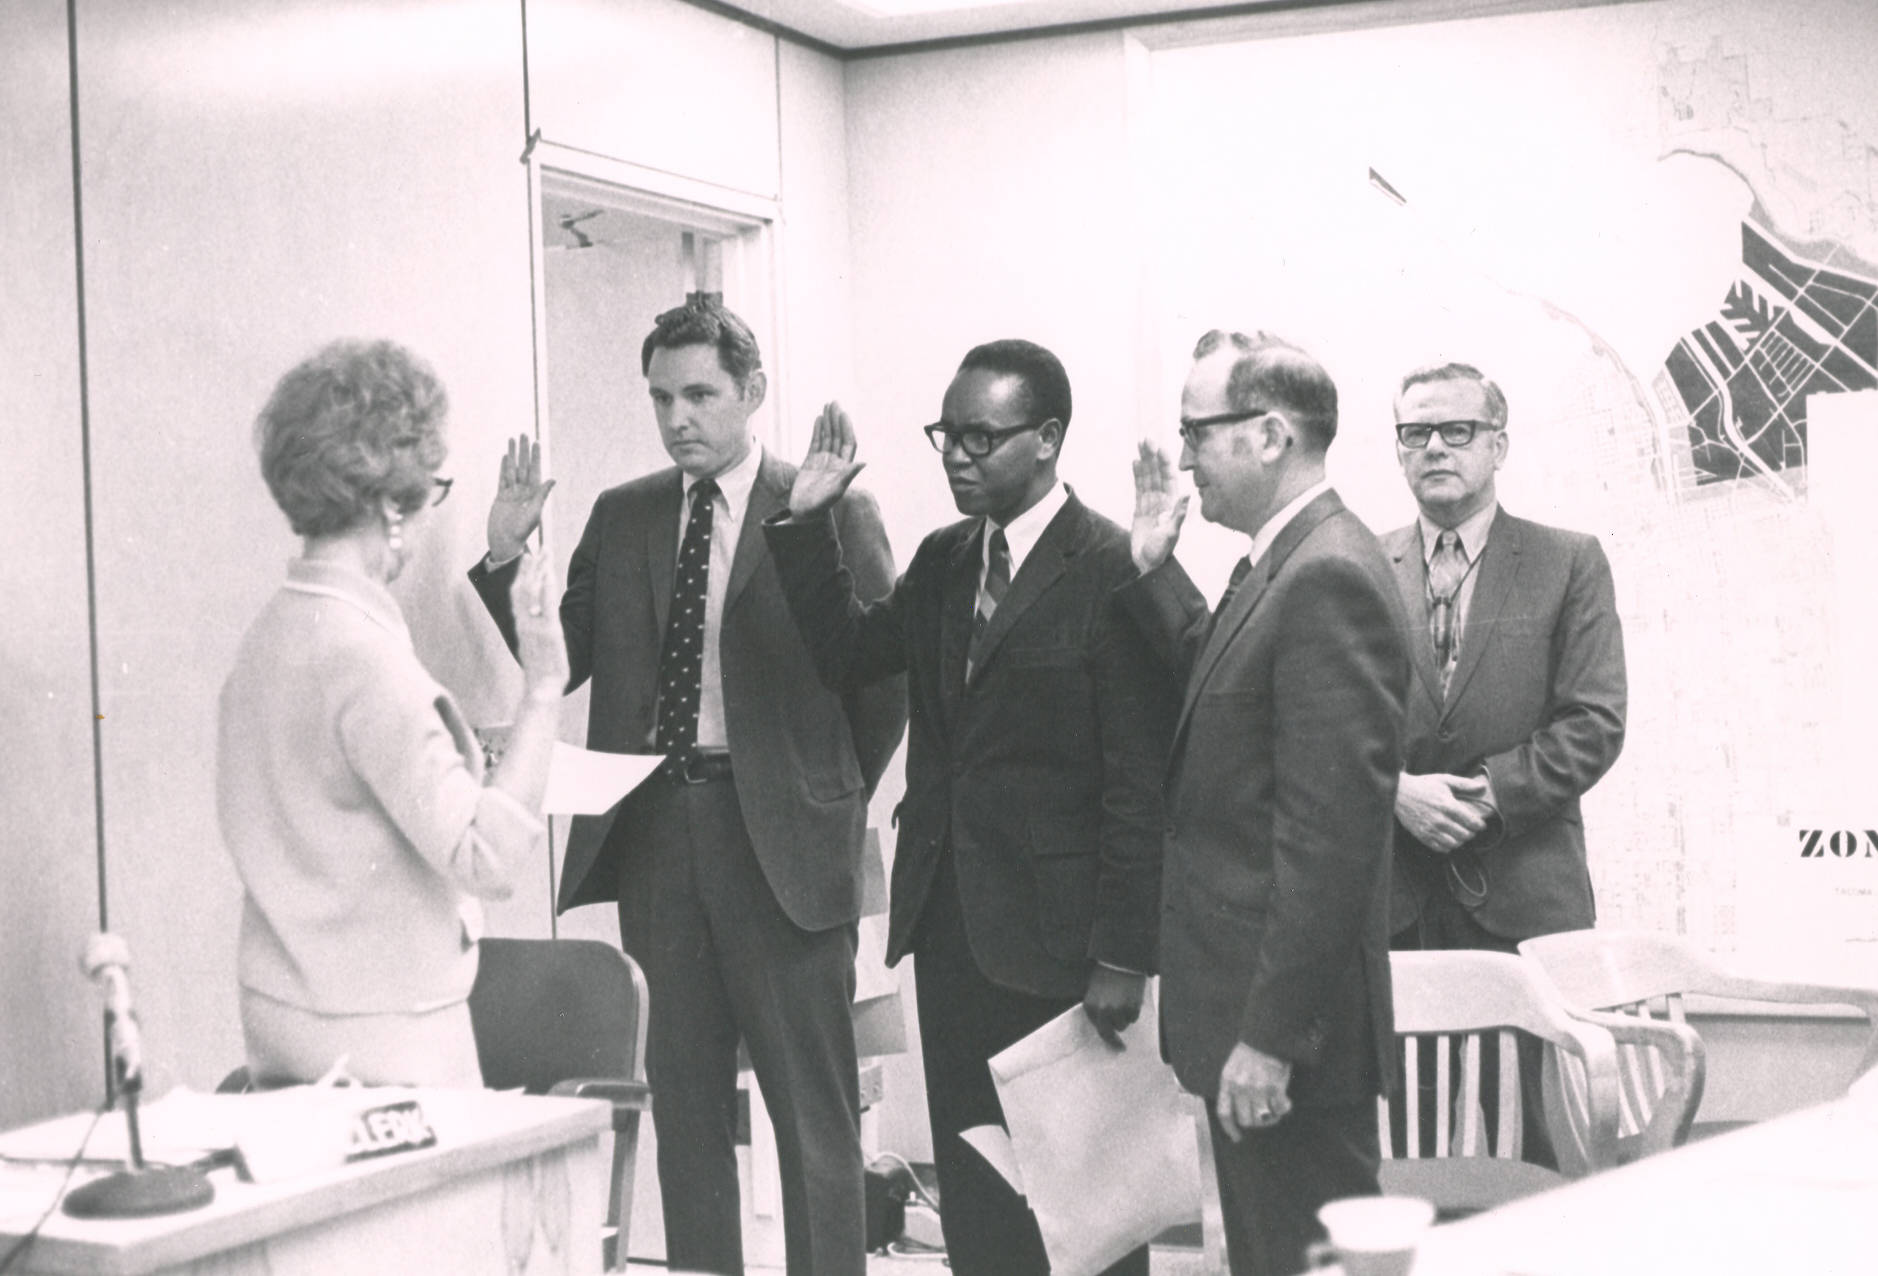 Harold Moss and other councilmen being sworn in